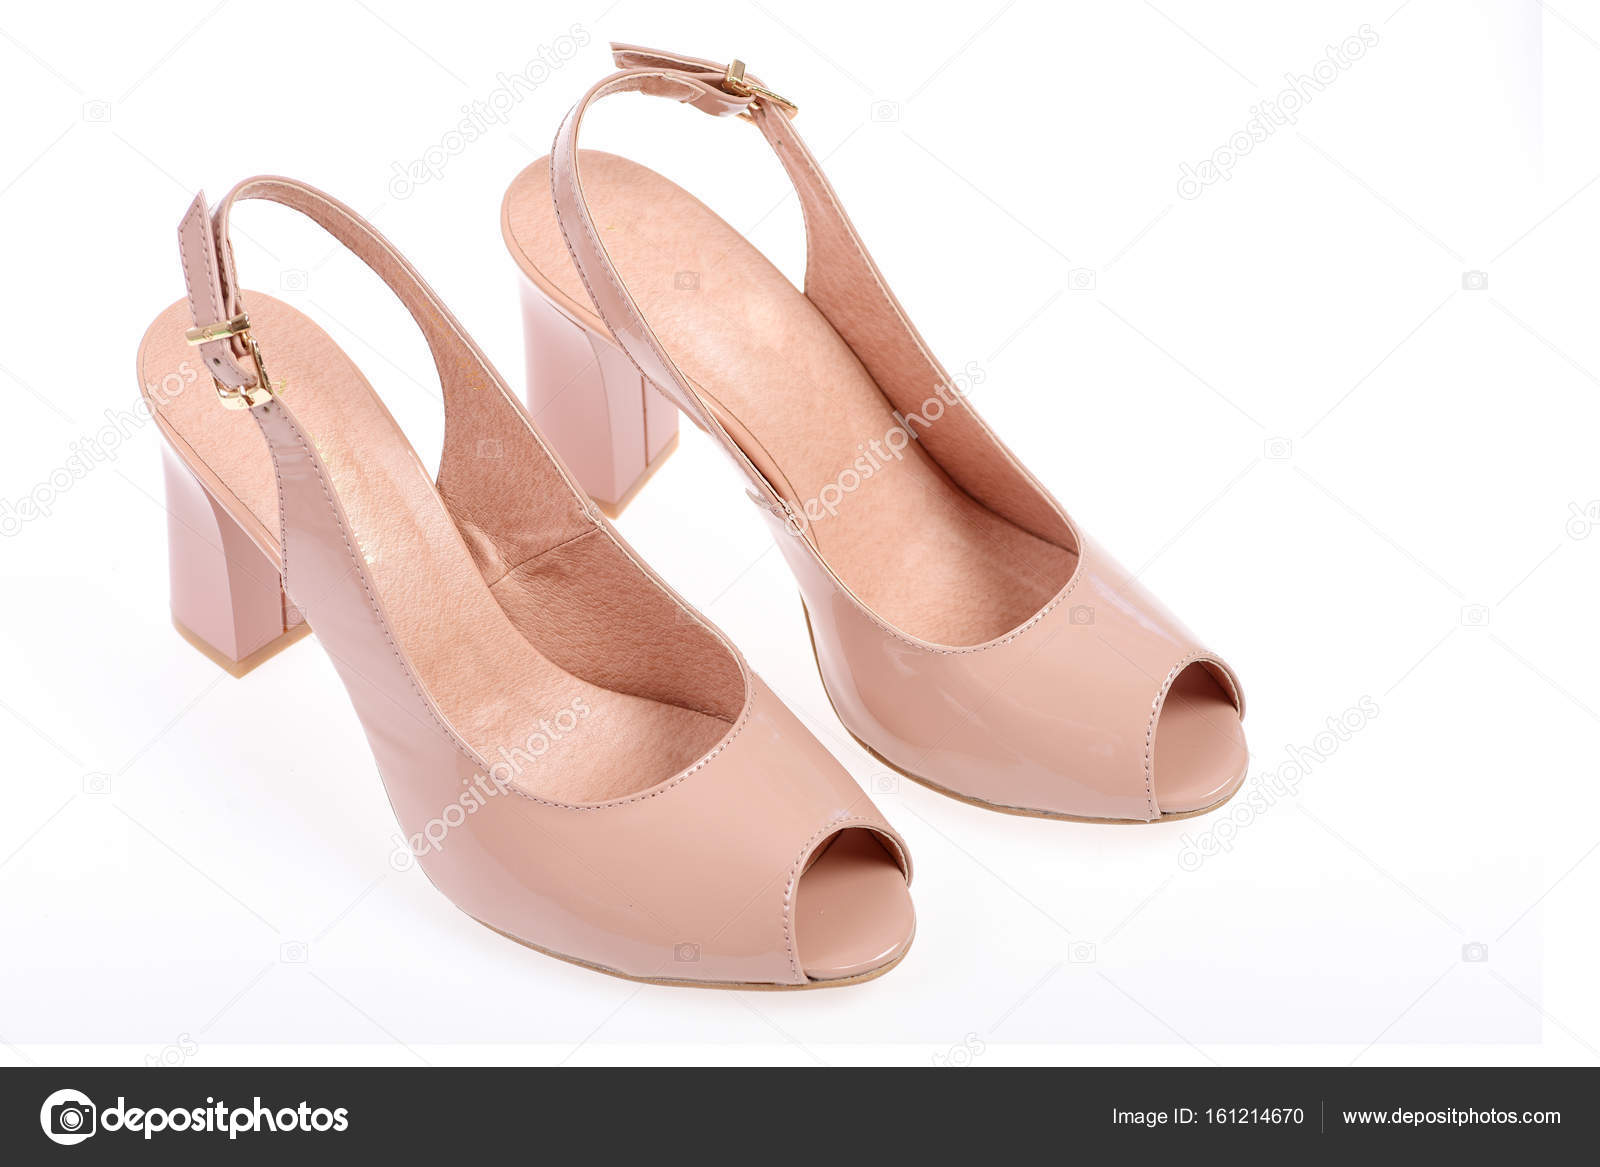 f693ce43625 Καλοκαιρινά αξεσουάρ: ψηλοτάκουνα πέδιλα. Έννοια της μόδας και της  ομορφιάς. Γυναικεία σανδάλια που απομονώνονται σε λευκό φόντο — Εικόνα από  ...